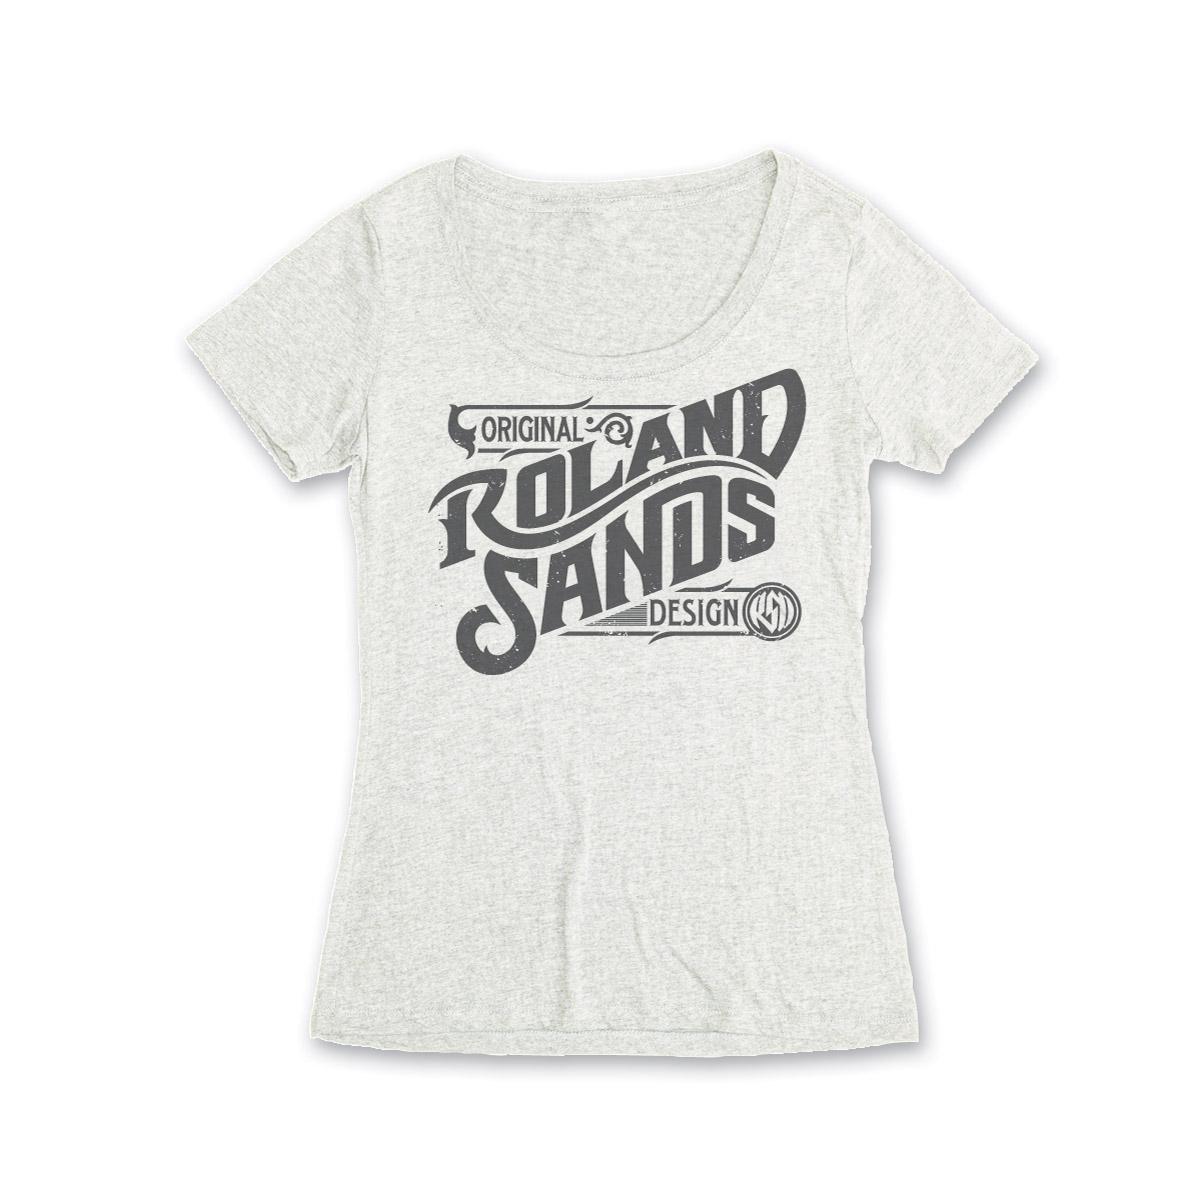 Roland Sands Design Original Design Women's Vintage White Scoop Neck T-Shirt